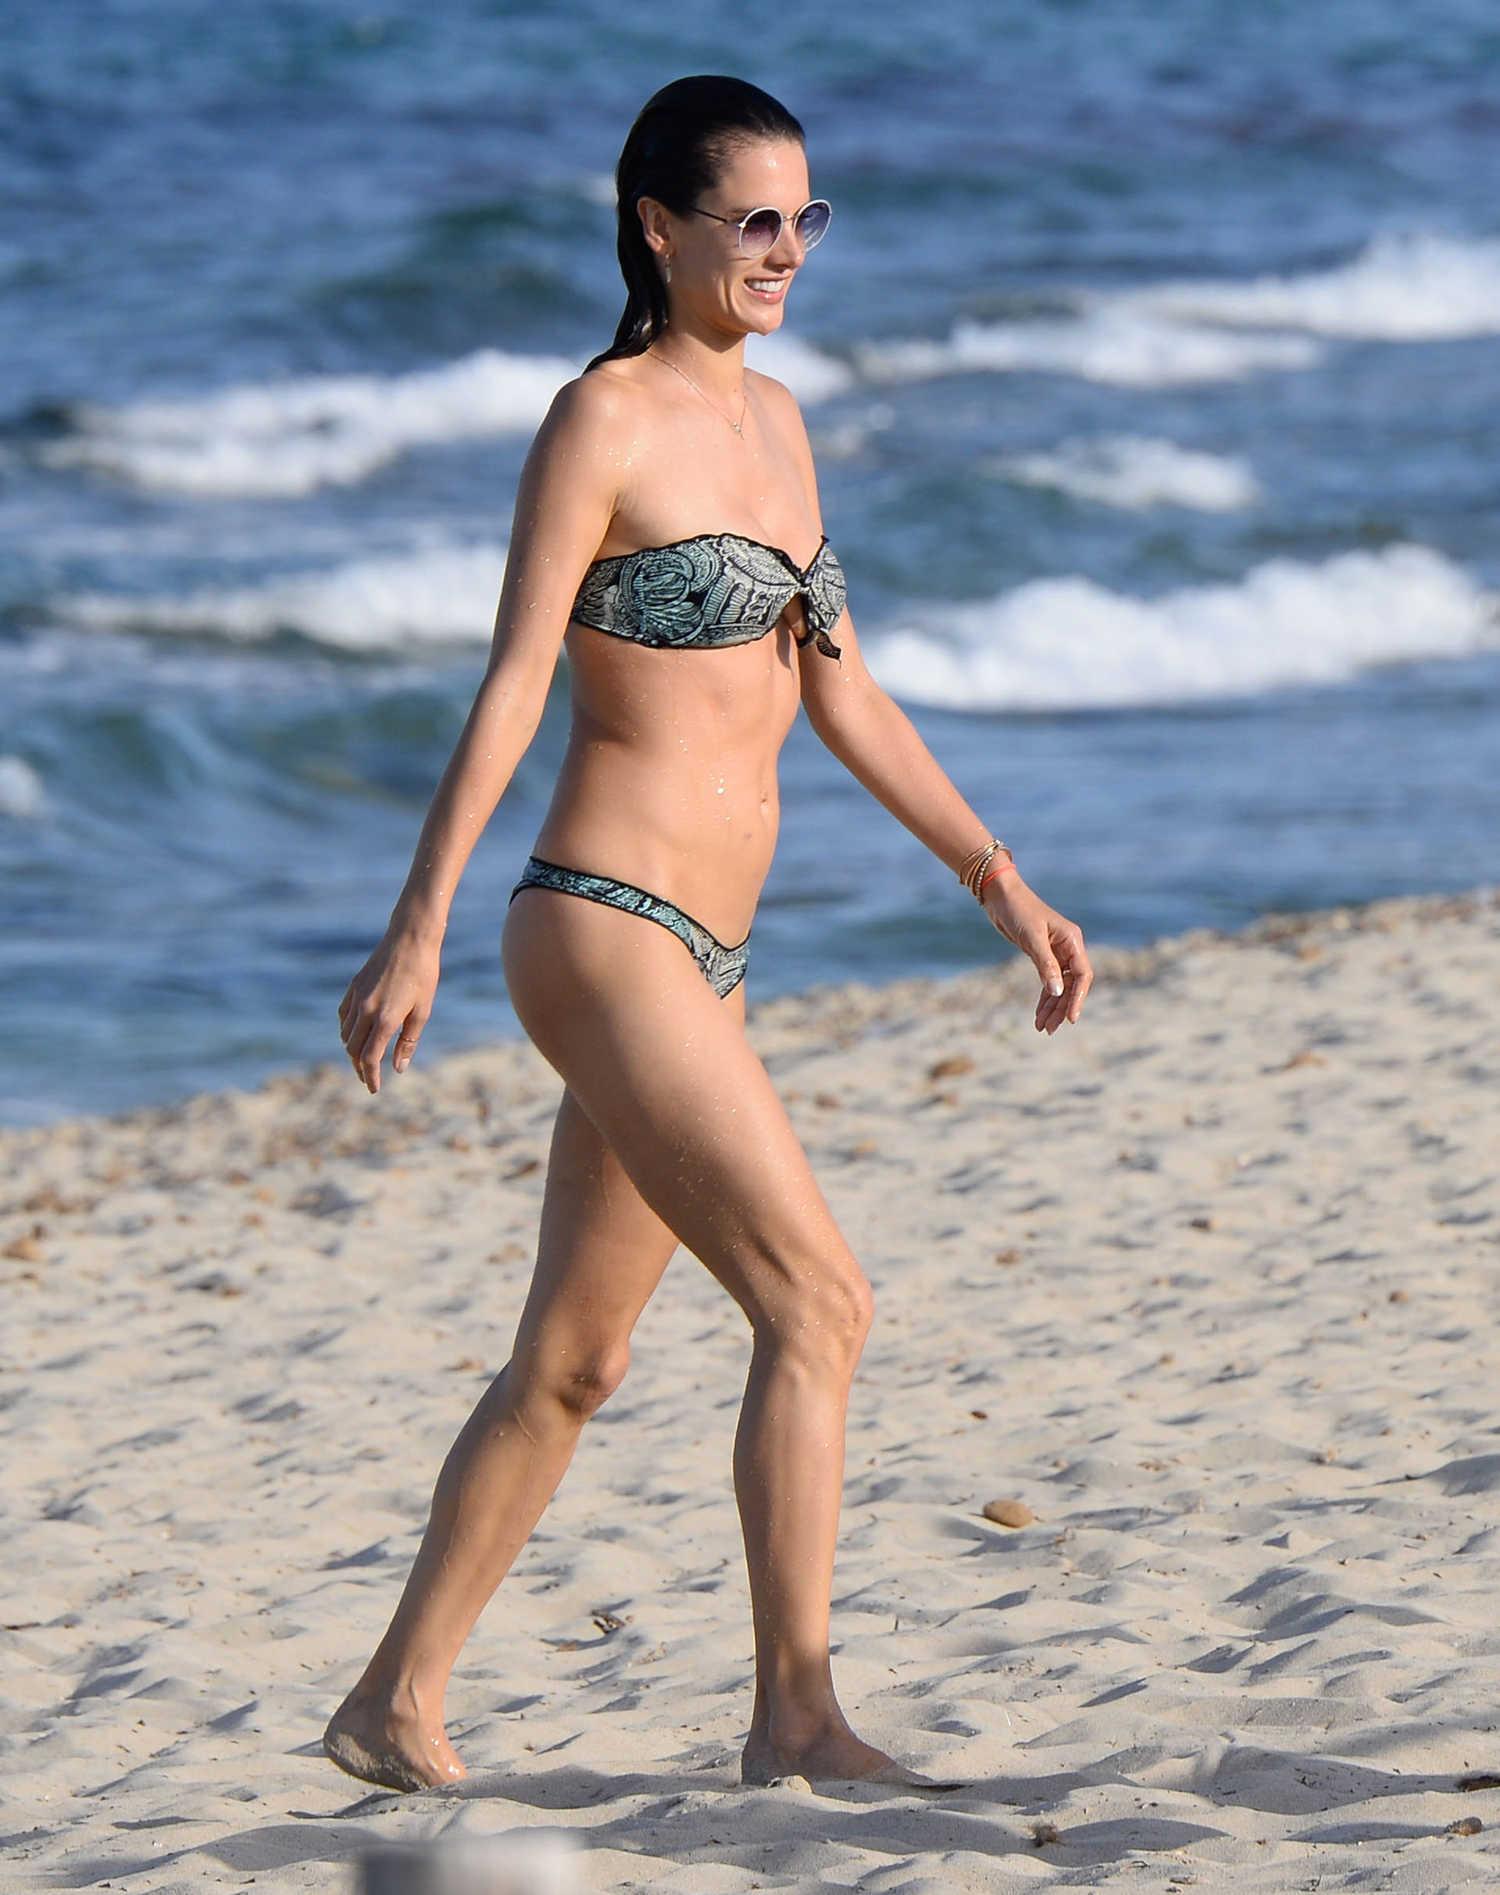 Alessandra Ambrosio Wearing a Bikini at the Beach in Ibiza ...